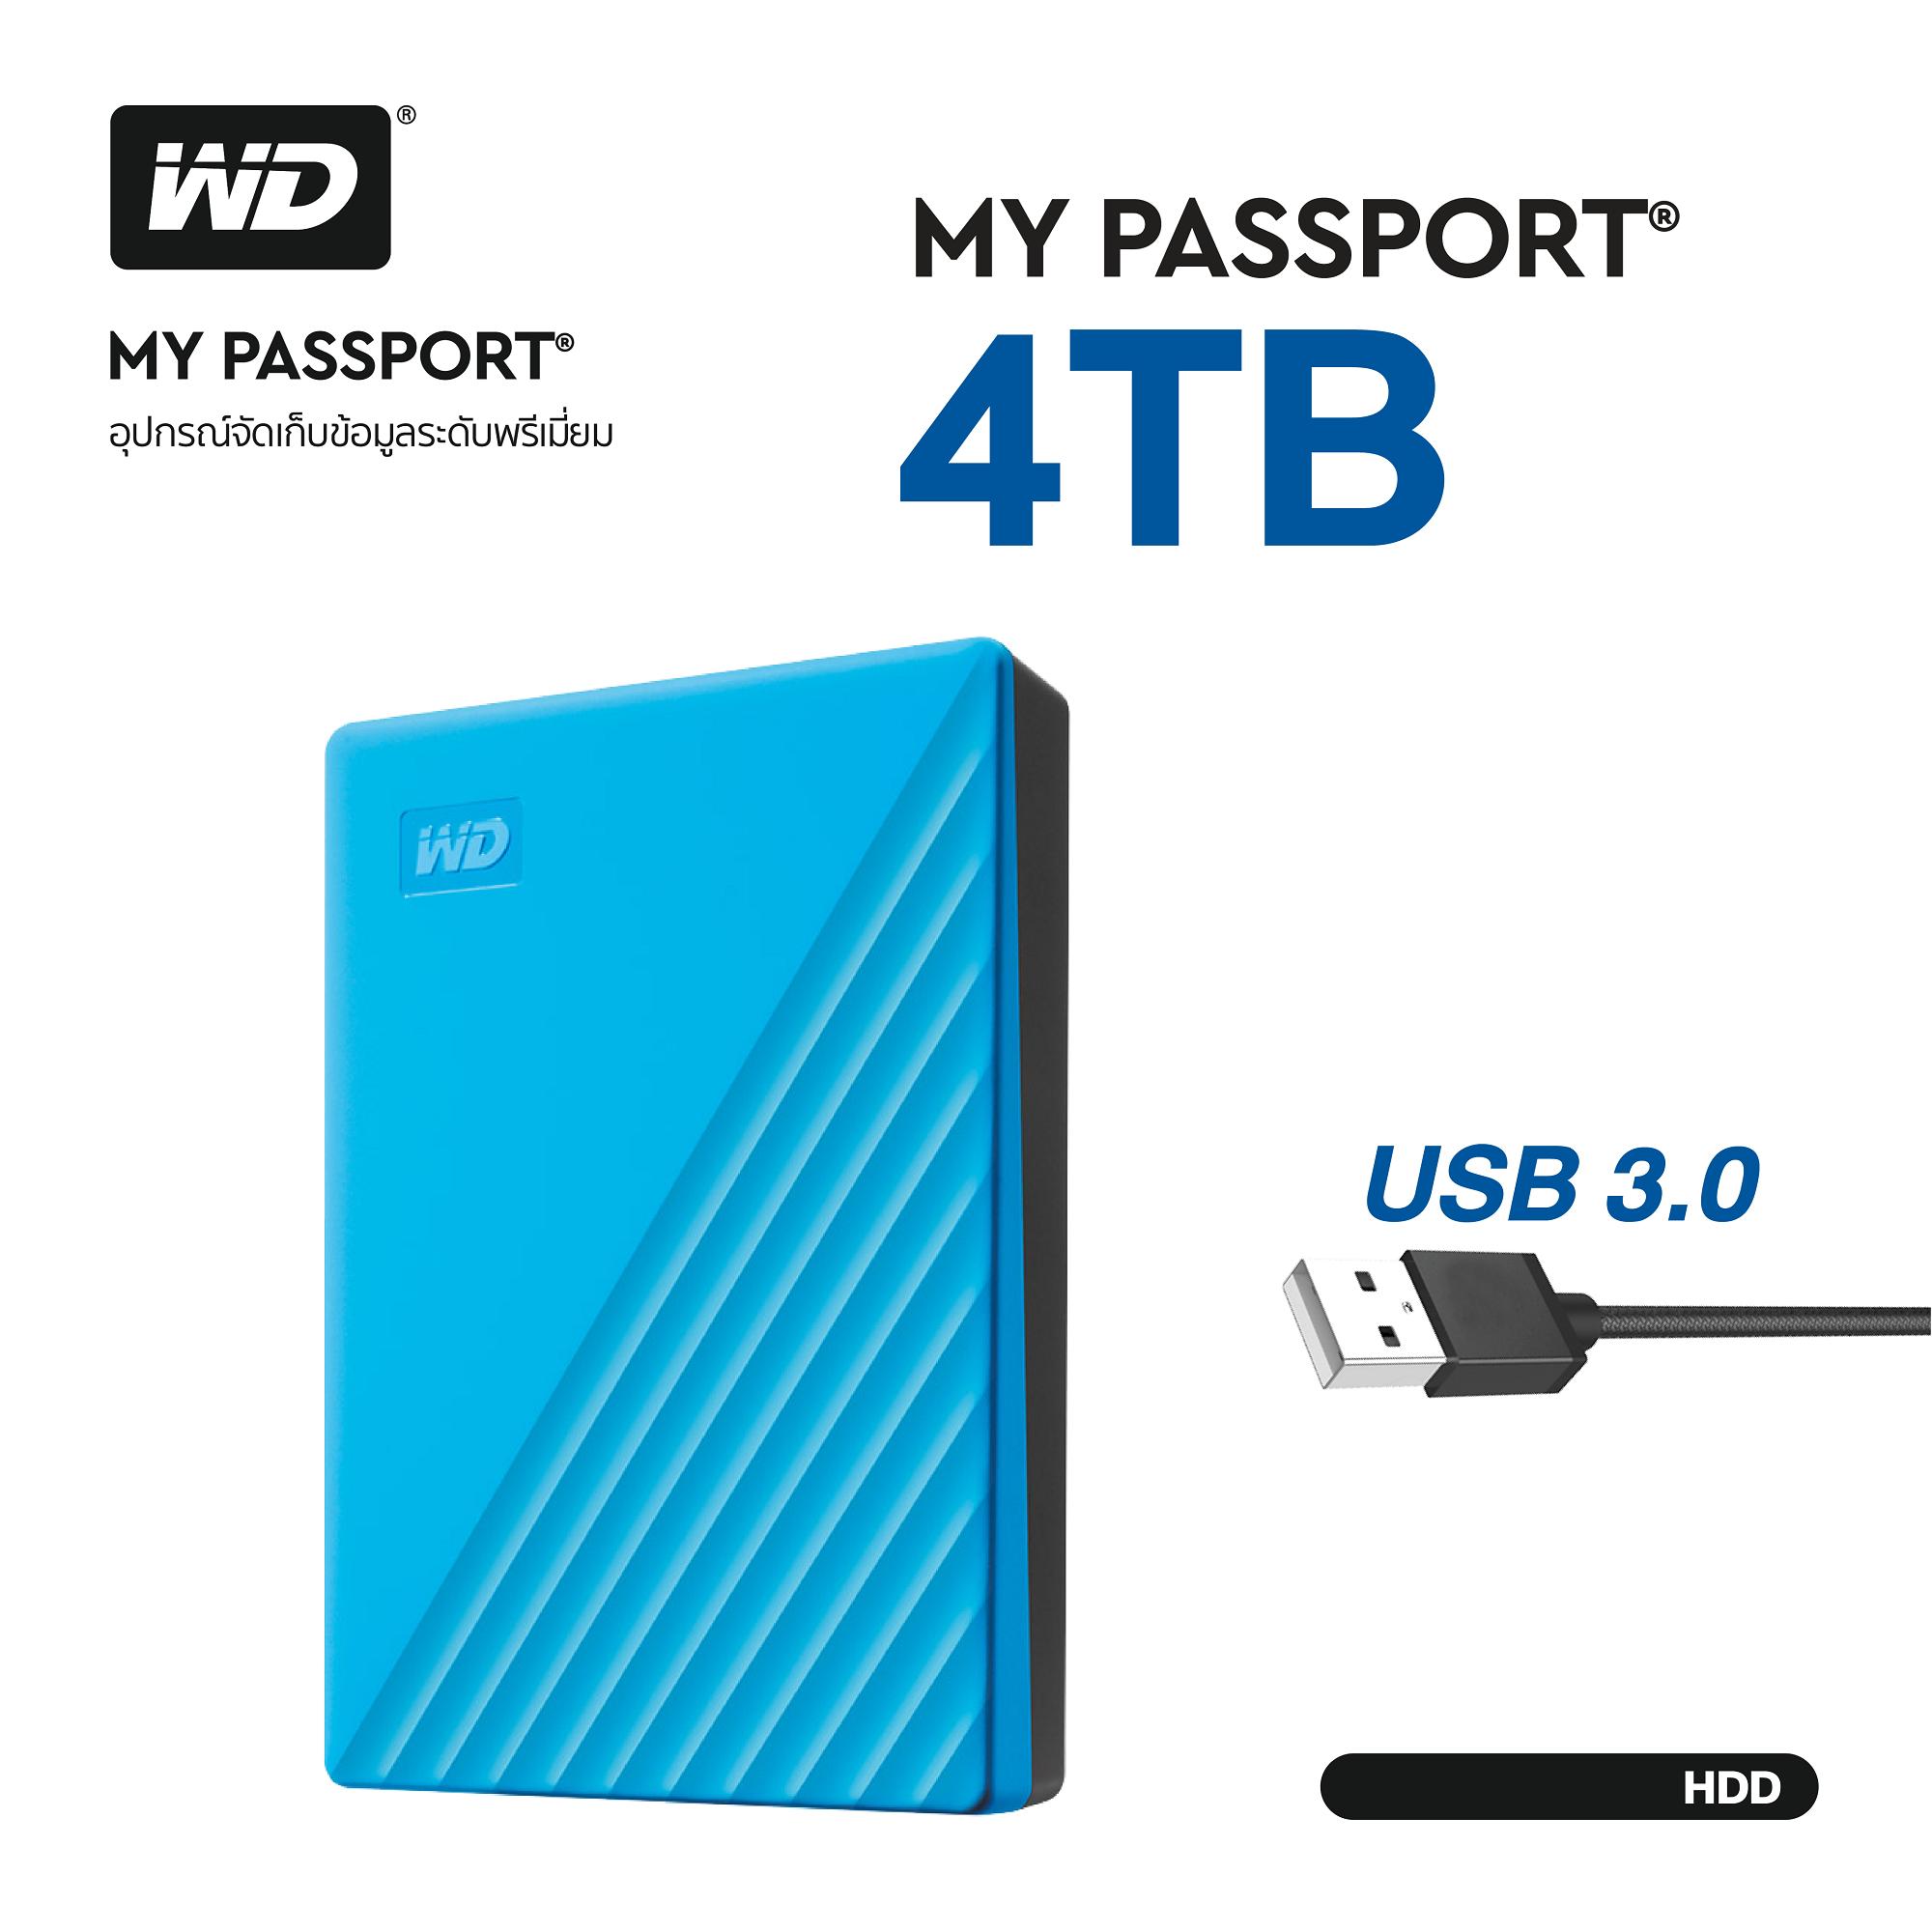 Wd My Passport 4tb, Blue, Usb 3.0, Hdd 2.5 ( Wdbpkj0040bbl-Wesn ) ( ฮาร์ดดิสพกพา Internal Harddisk Harddrive ).